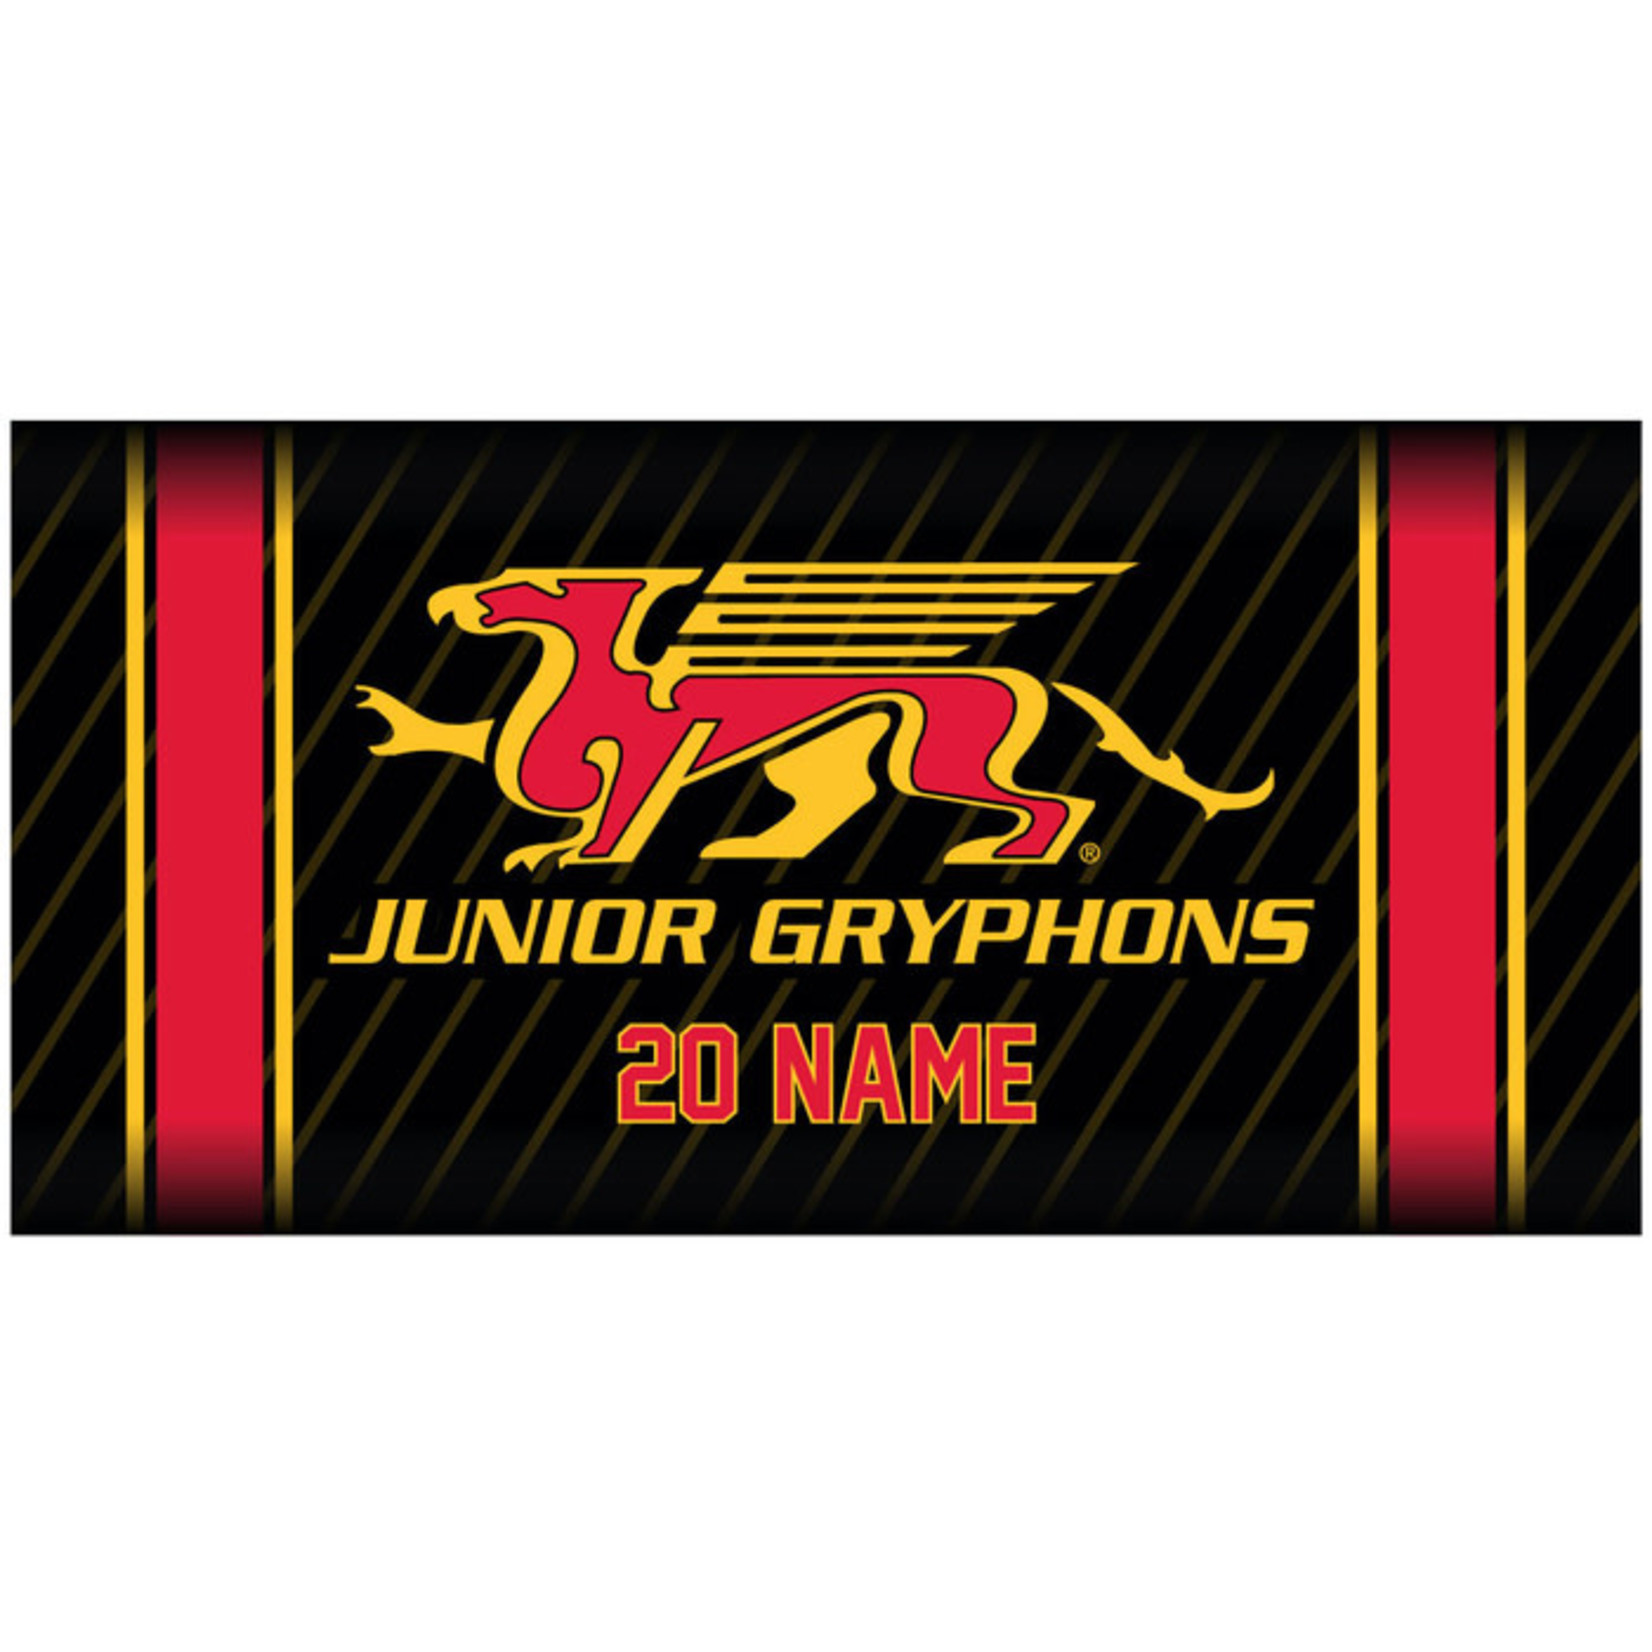 Provision JR GRYPHONS BEACH TOWEL